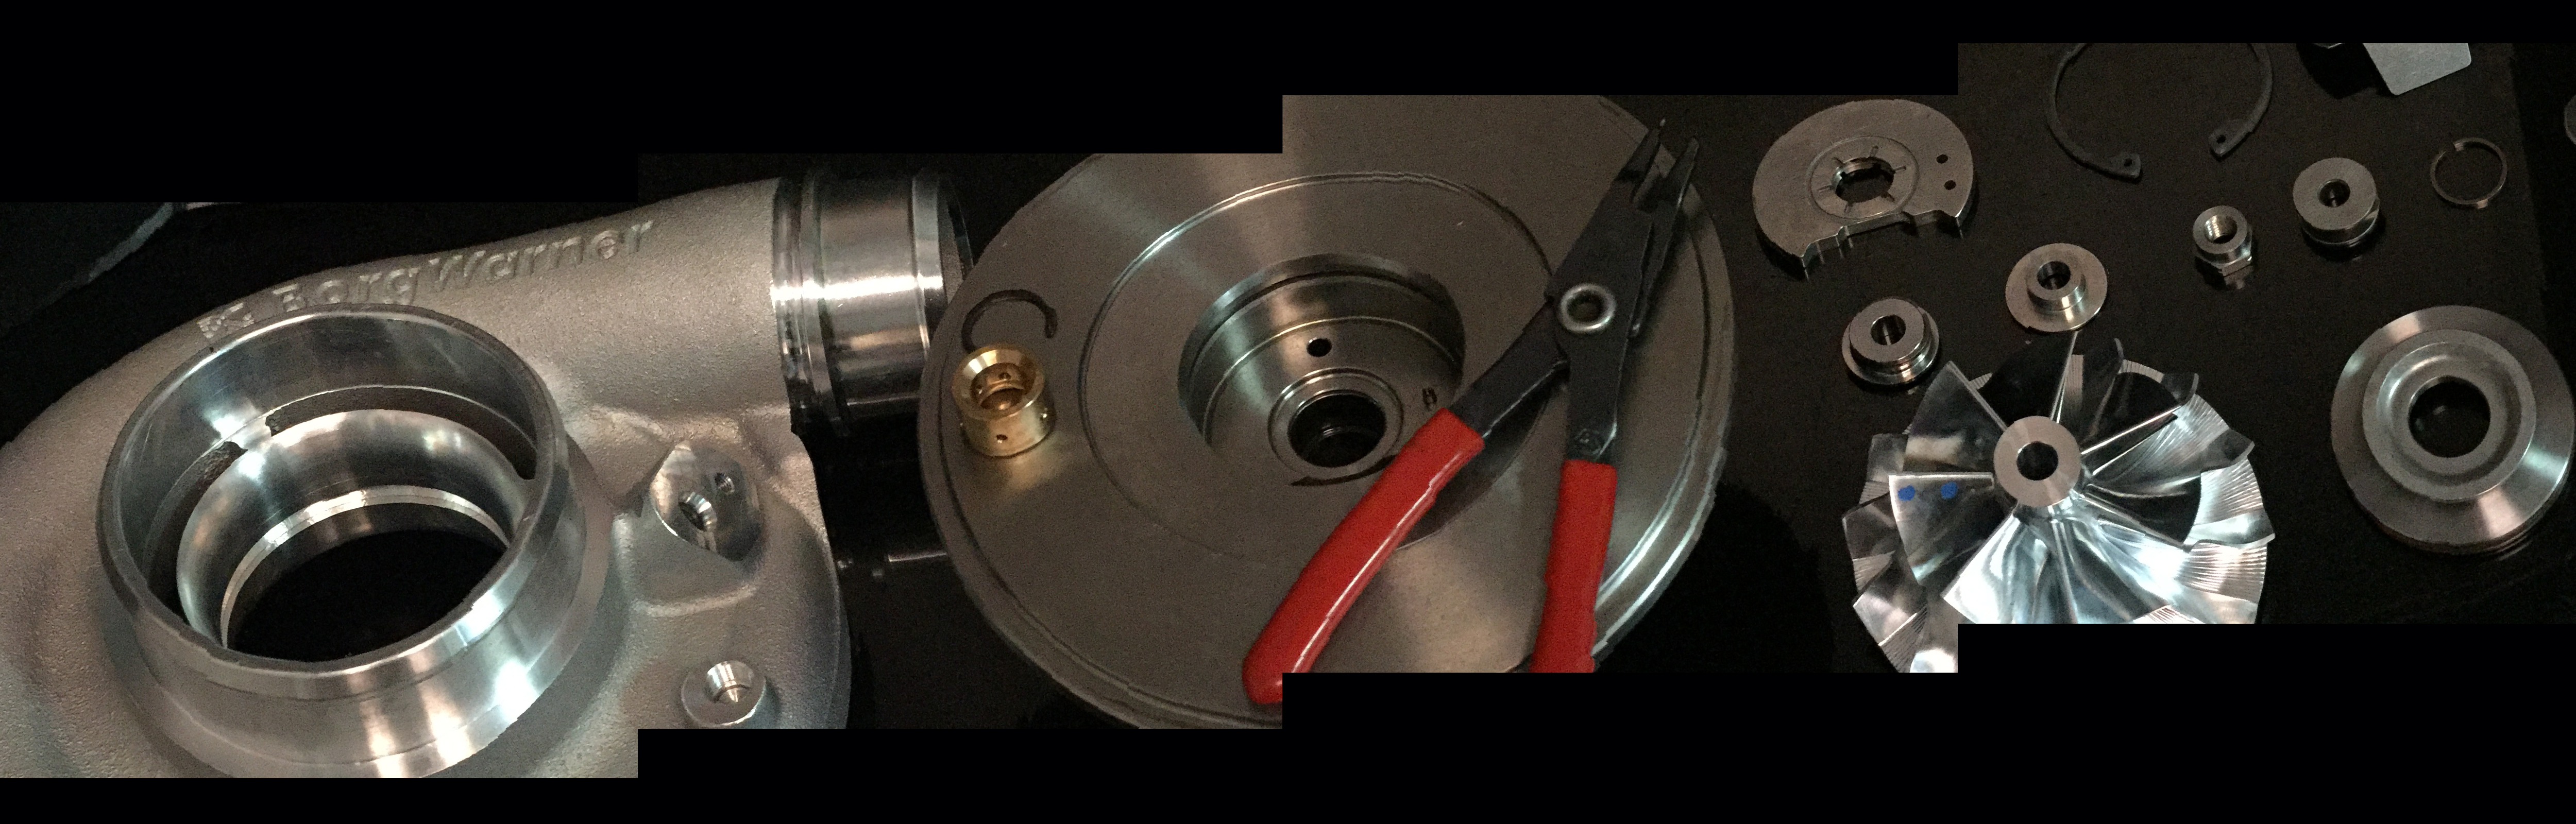 clean-turbo-parts2.jpg